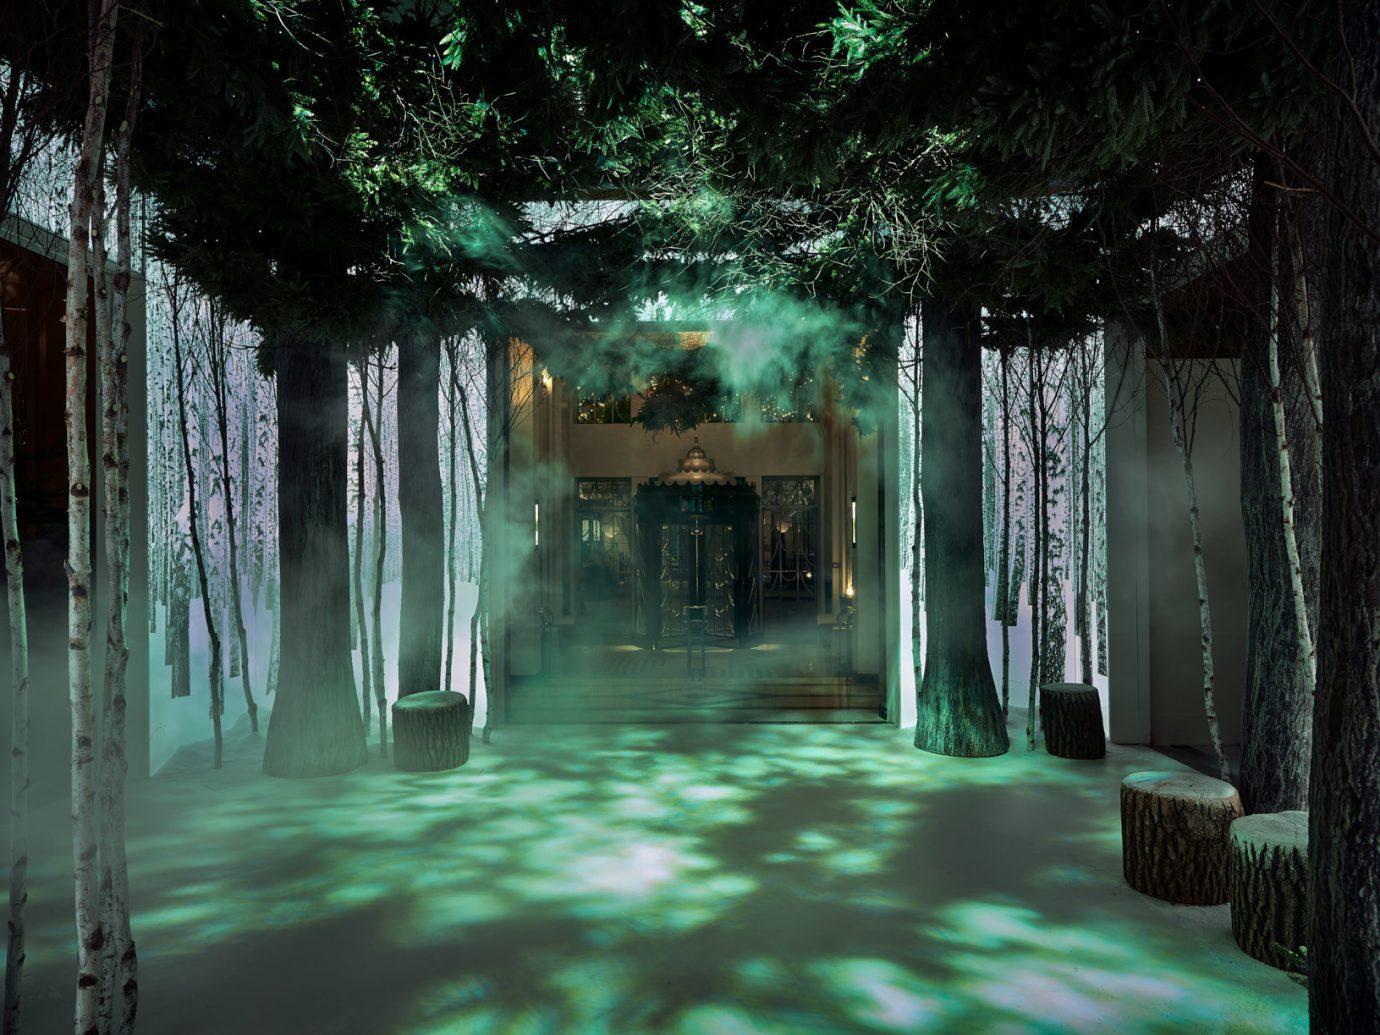 Hotels tree night light darkness reflection Forest screenshot sunlight ice day